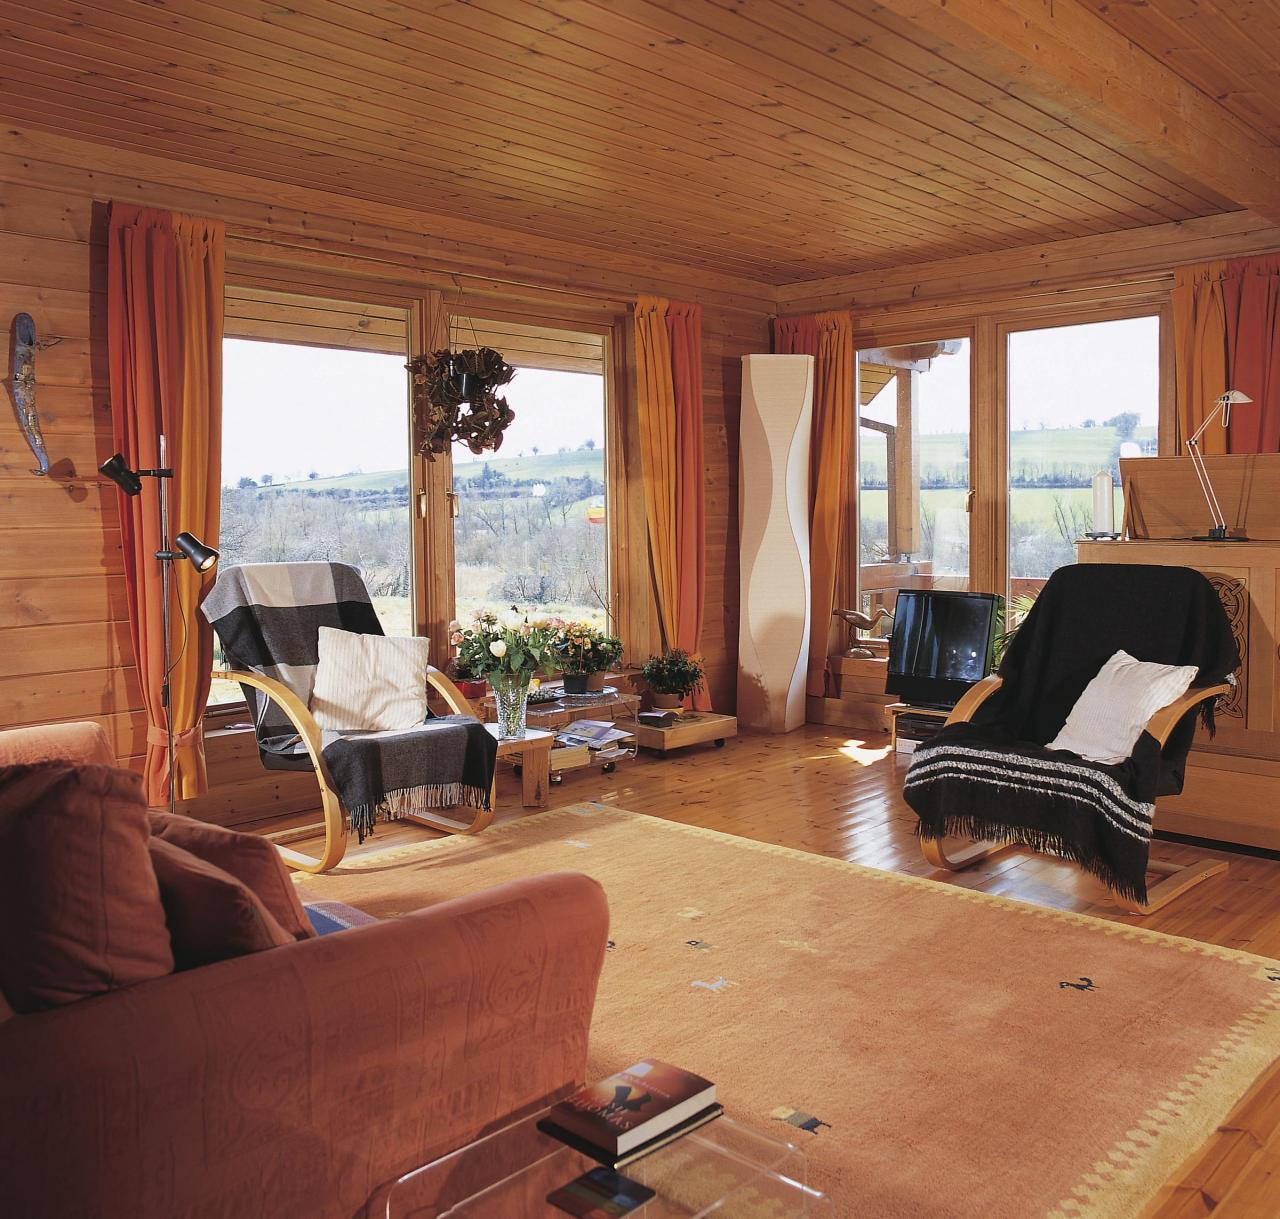 Homes Portfolio - Price Guide - scotframe.co.uk